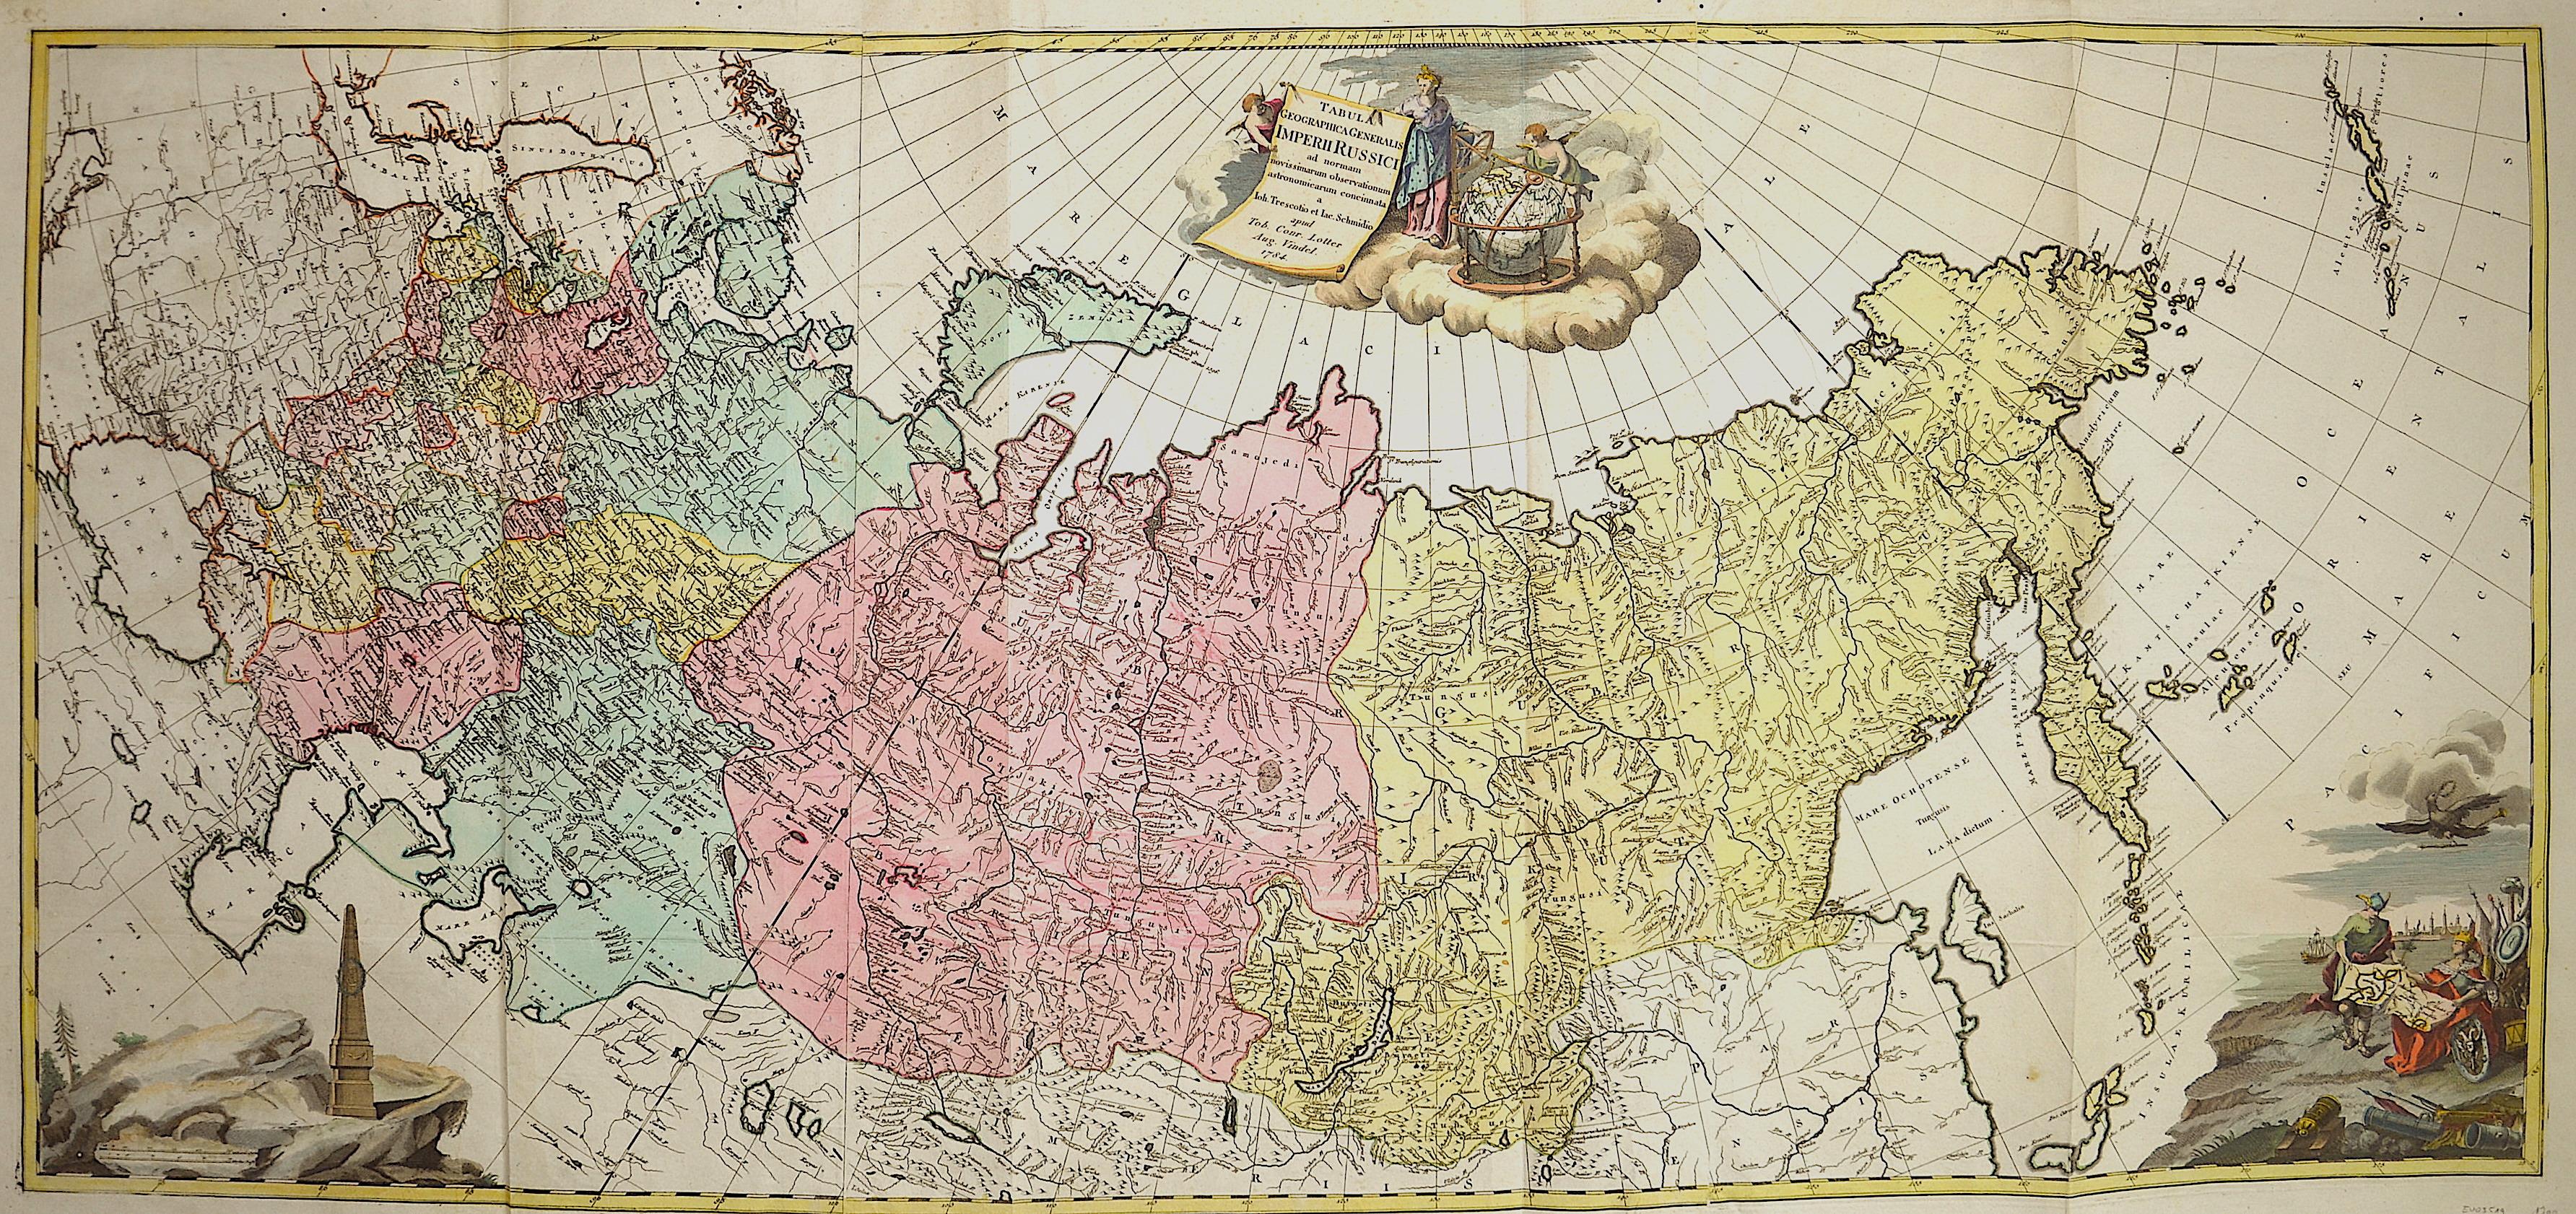 Treskot/ Schmidt Johann/ Jacob Tabula Geographica Generalis Imperii Russici ad normam novis sinarum observationum astronomiearum concinnata.